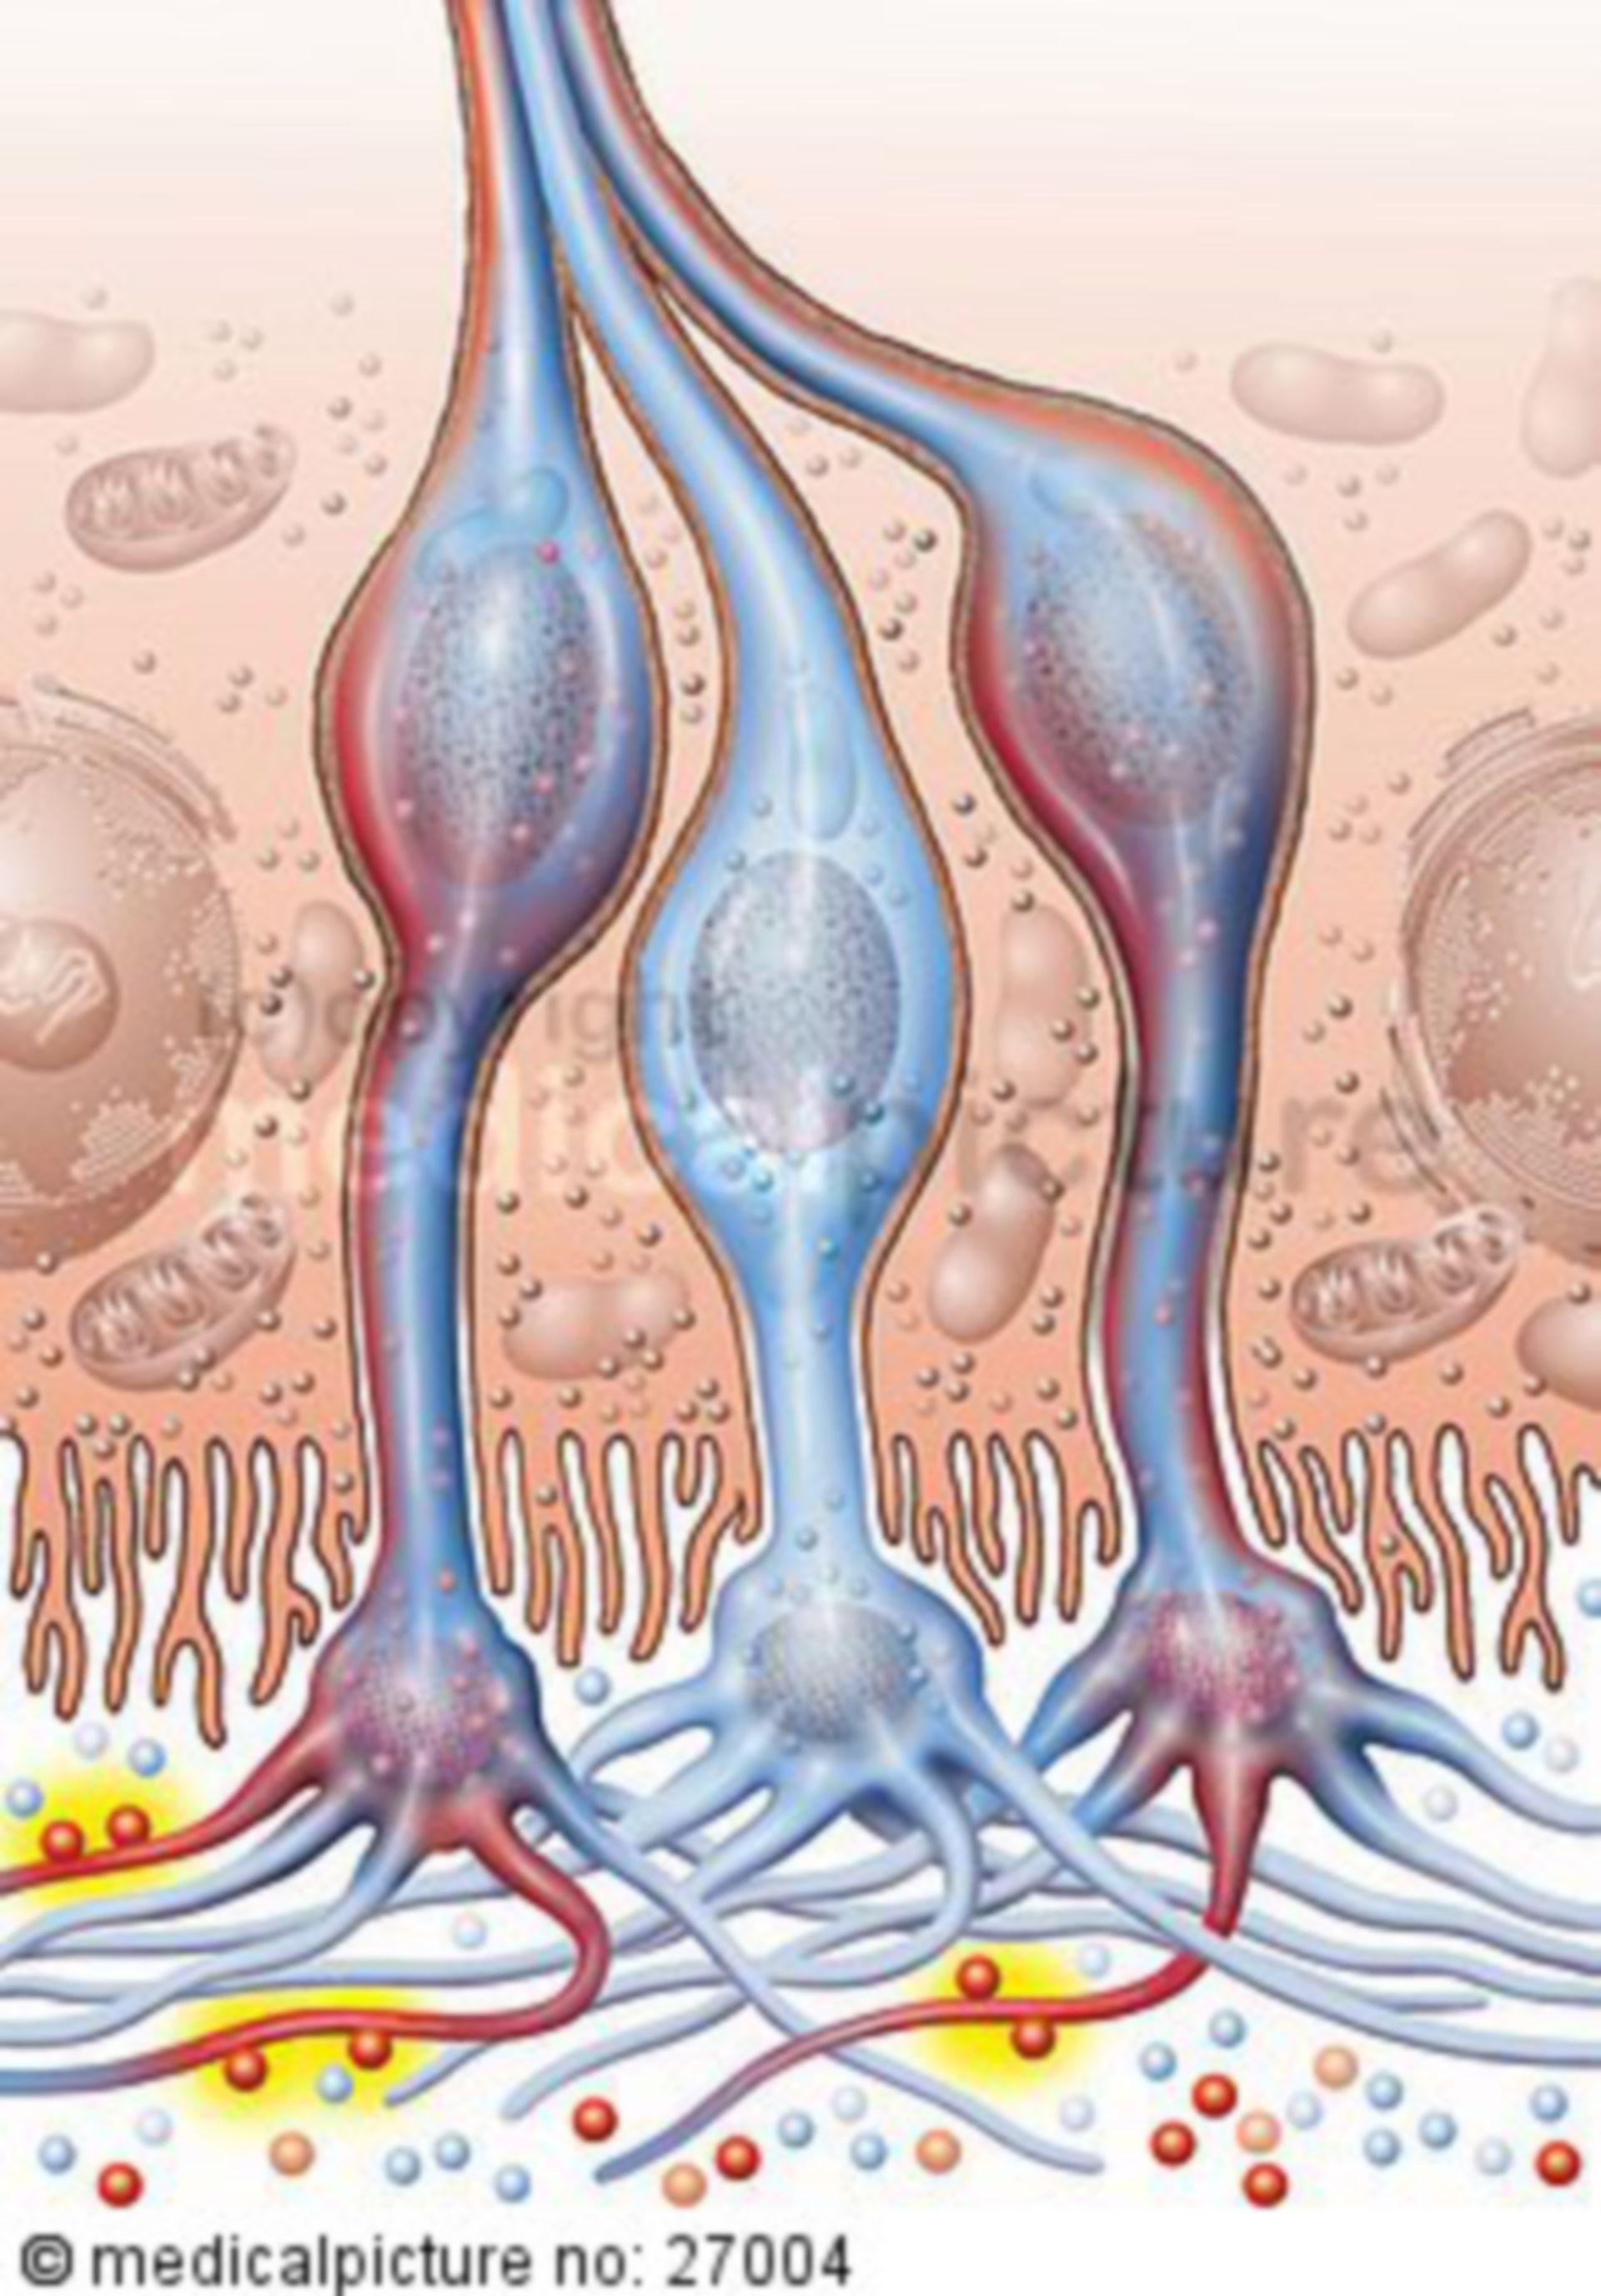 Olfactory cells with kinocilia